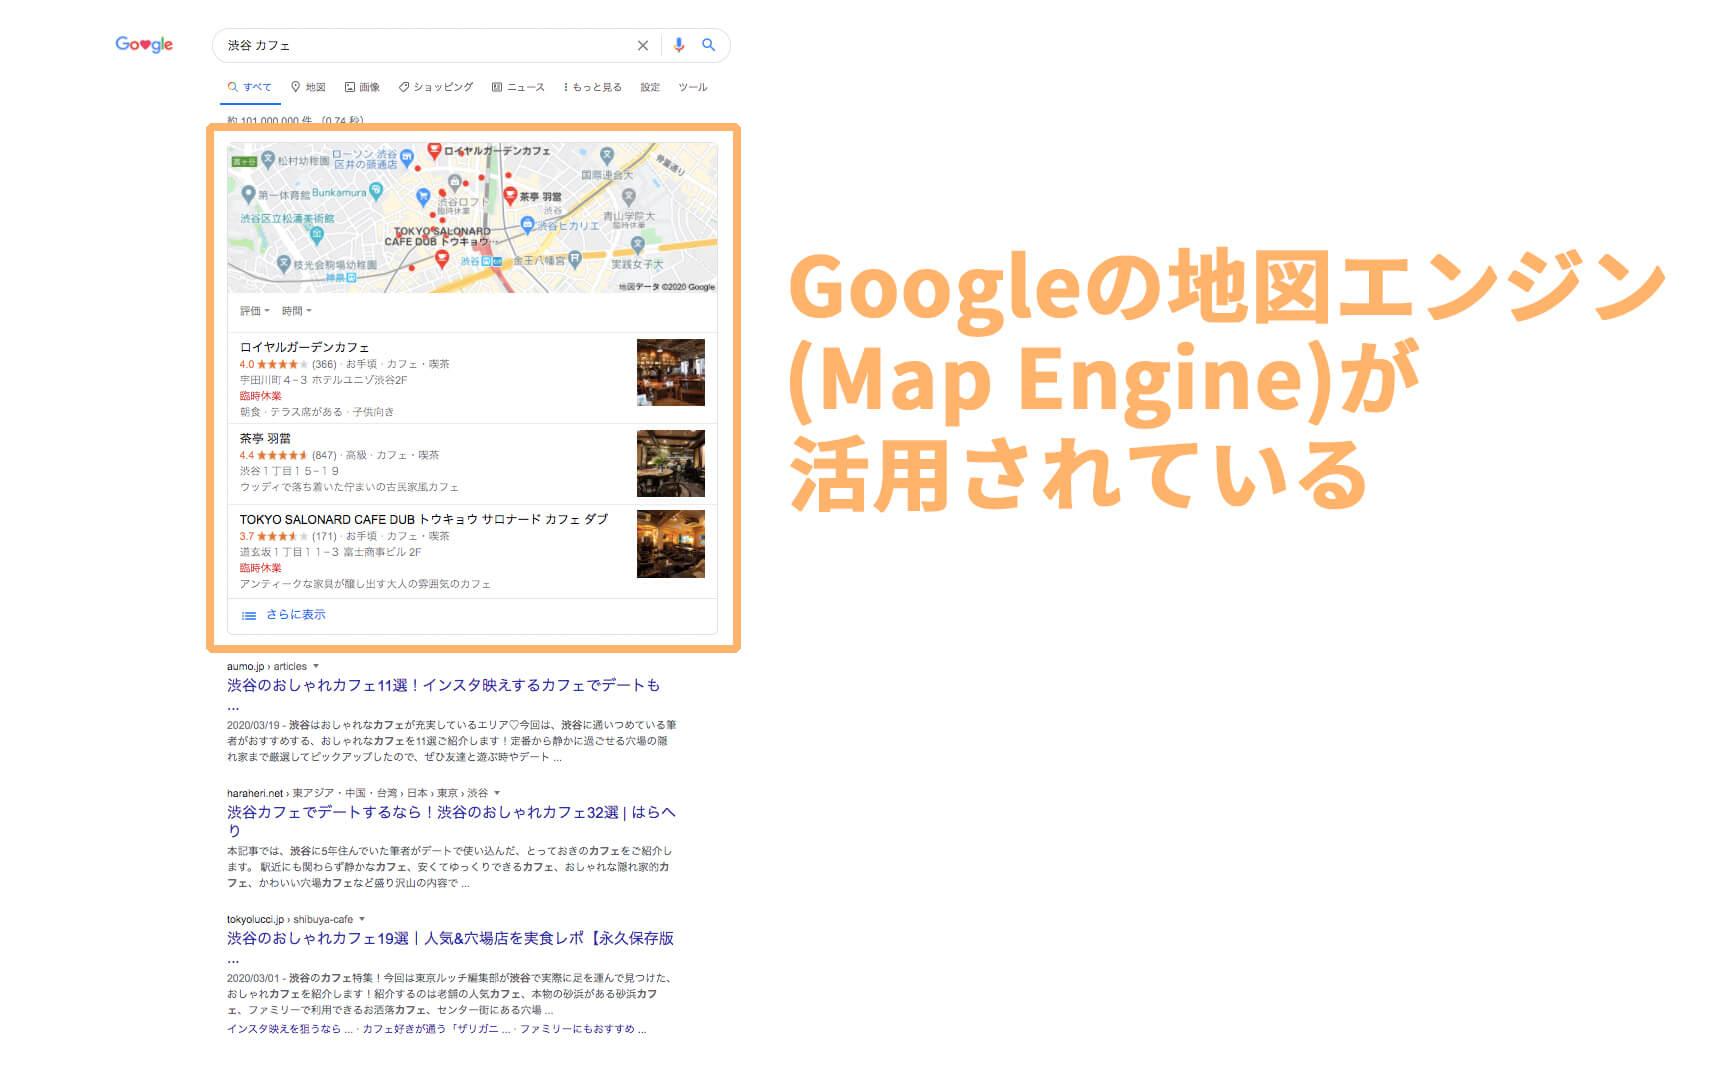 Googleでローカル検索をすると上部にマップ情報が表示される